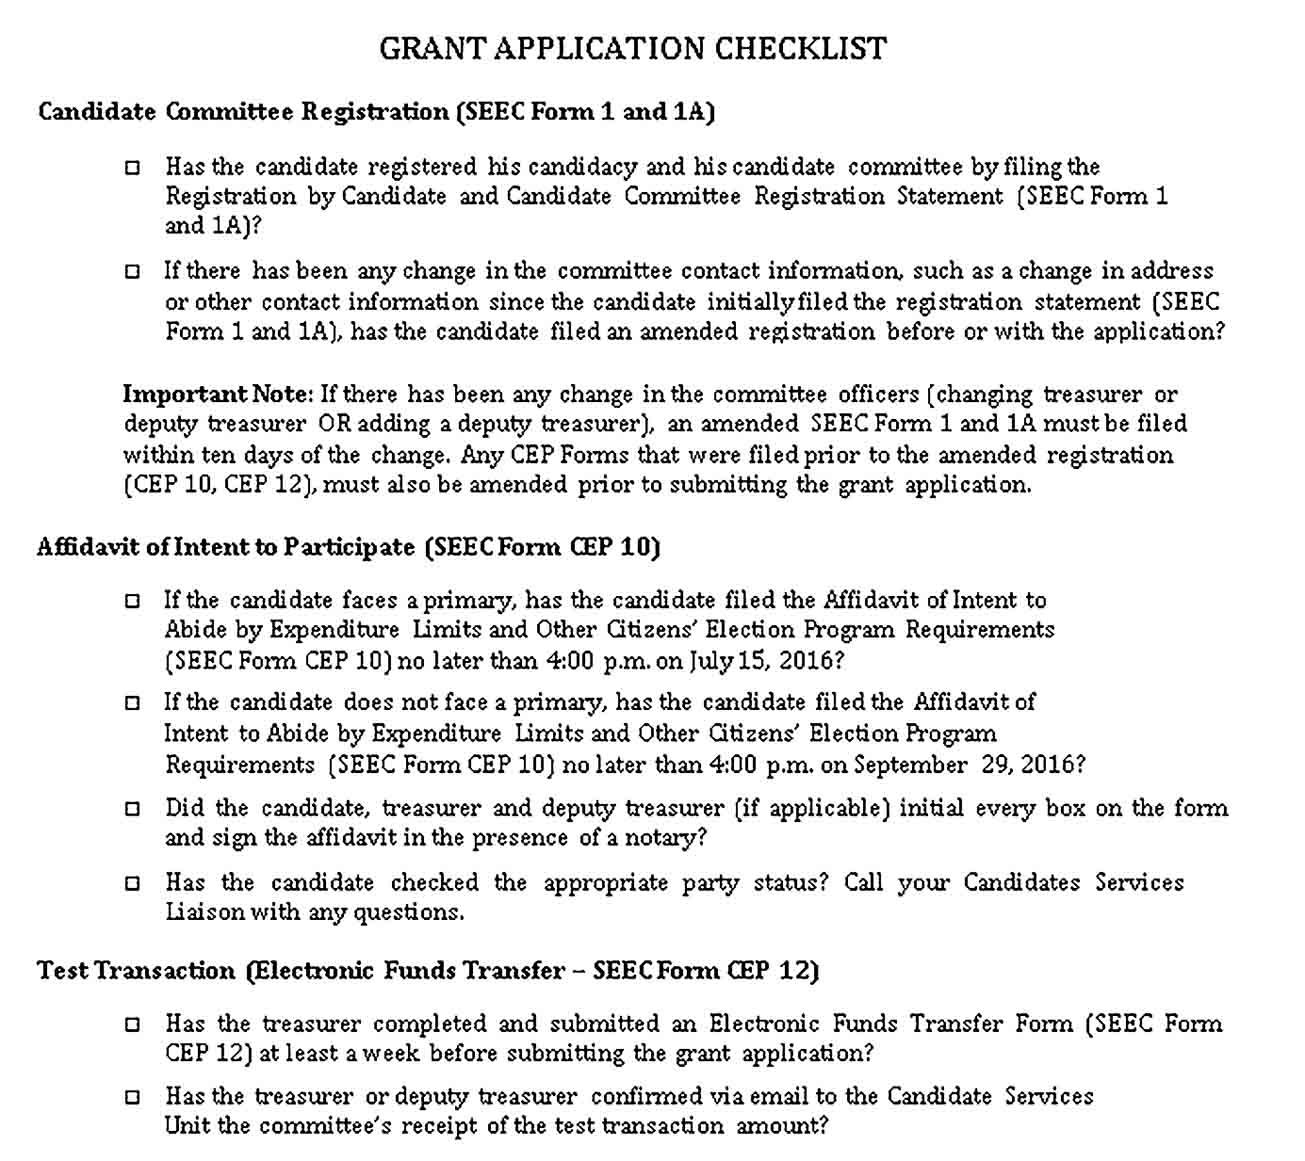 Sample Election Grant Application Checklist Template Grant Checklist Template